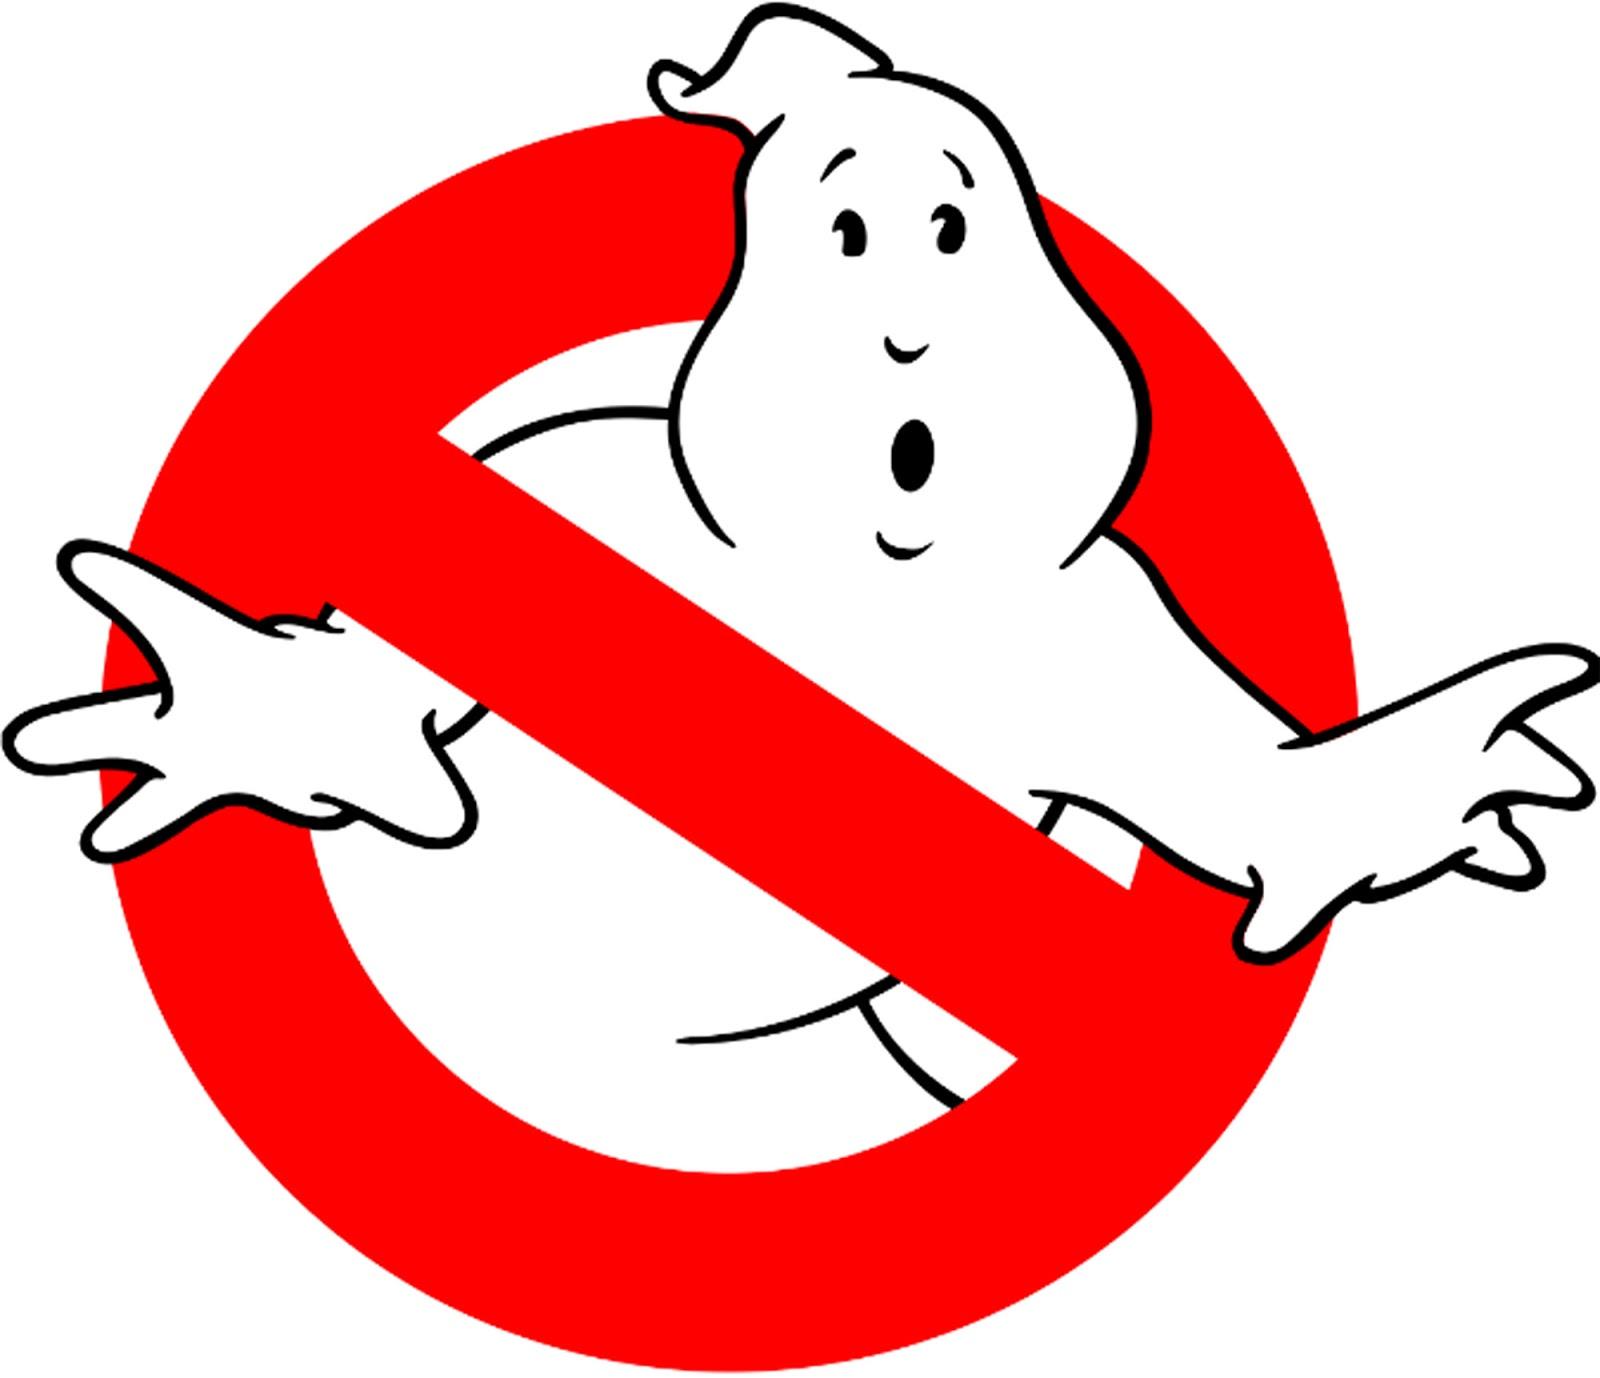 ghostbusters logos